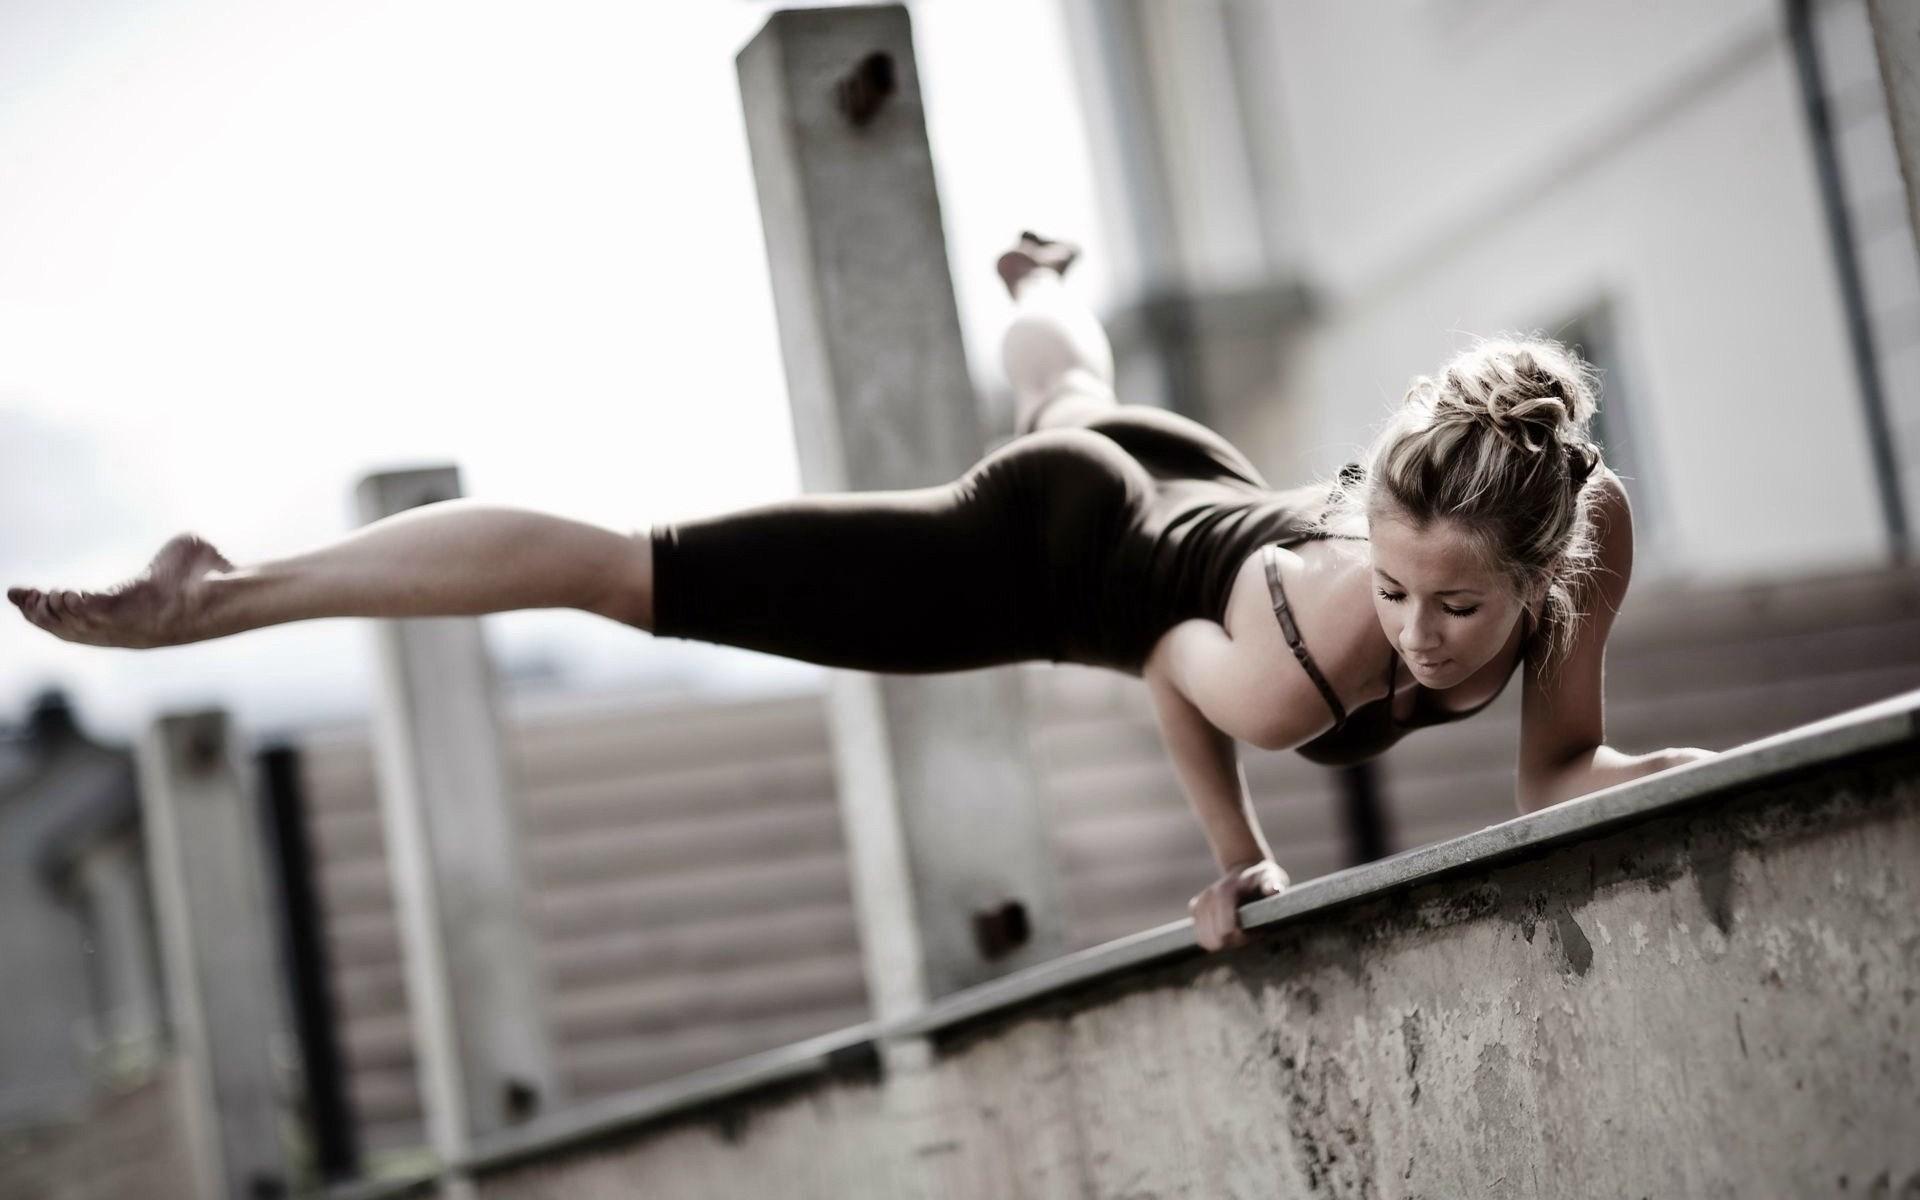 … fitness wallpaper qygjxz; hd wallpapers backgrounds download free …